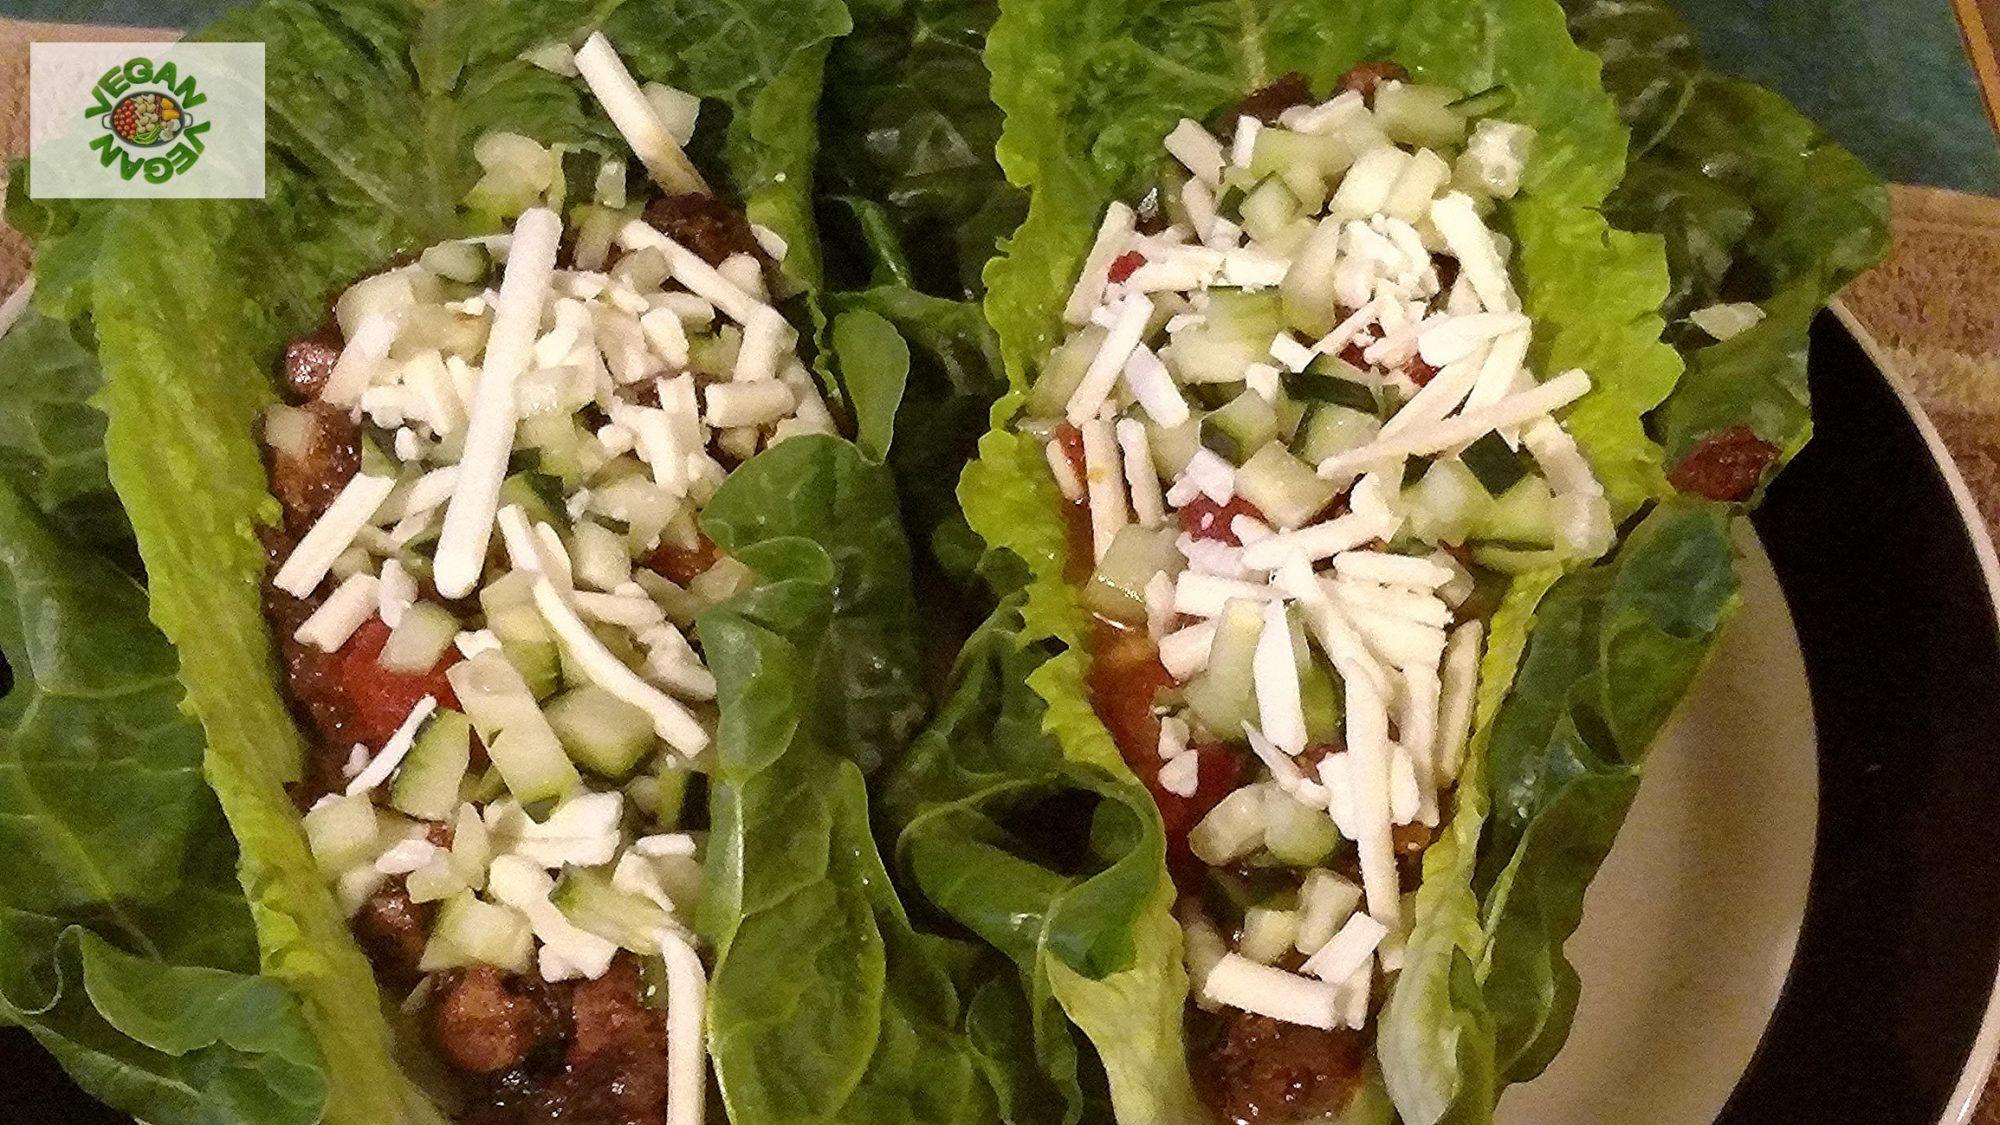 Vegan tacos recipe in lettuce wraps feature photo. 100% vegan. 100% healthy. 100% delicious.